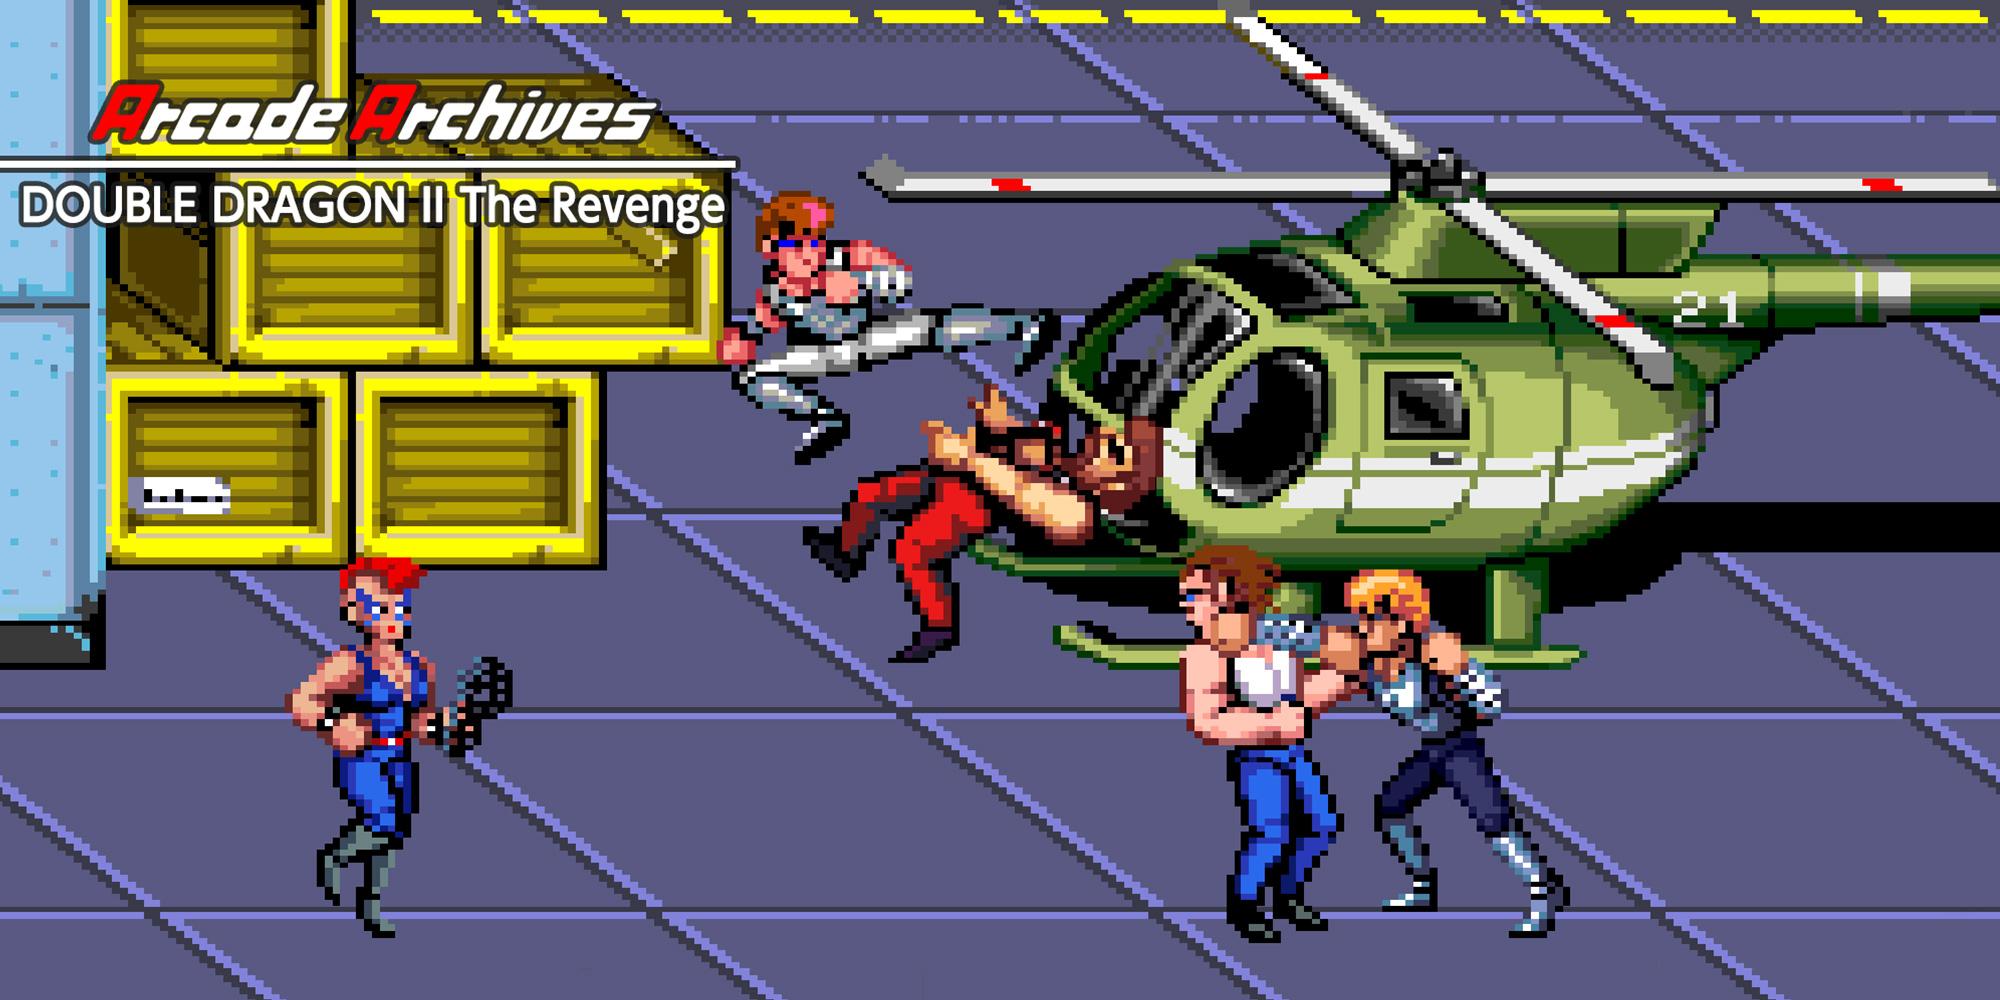 Arcade Archives Double Dragon Ii The Revenge Nintendo Switch